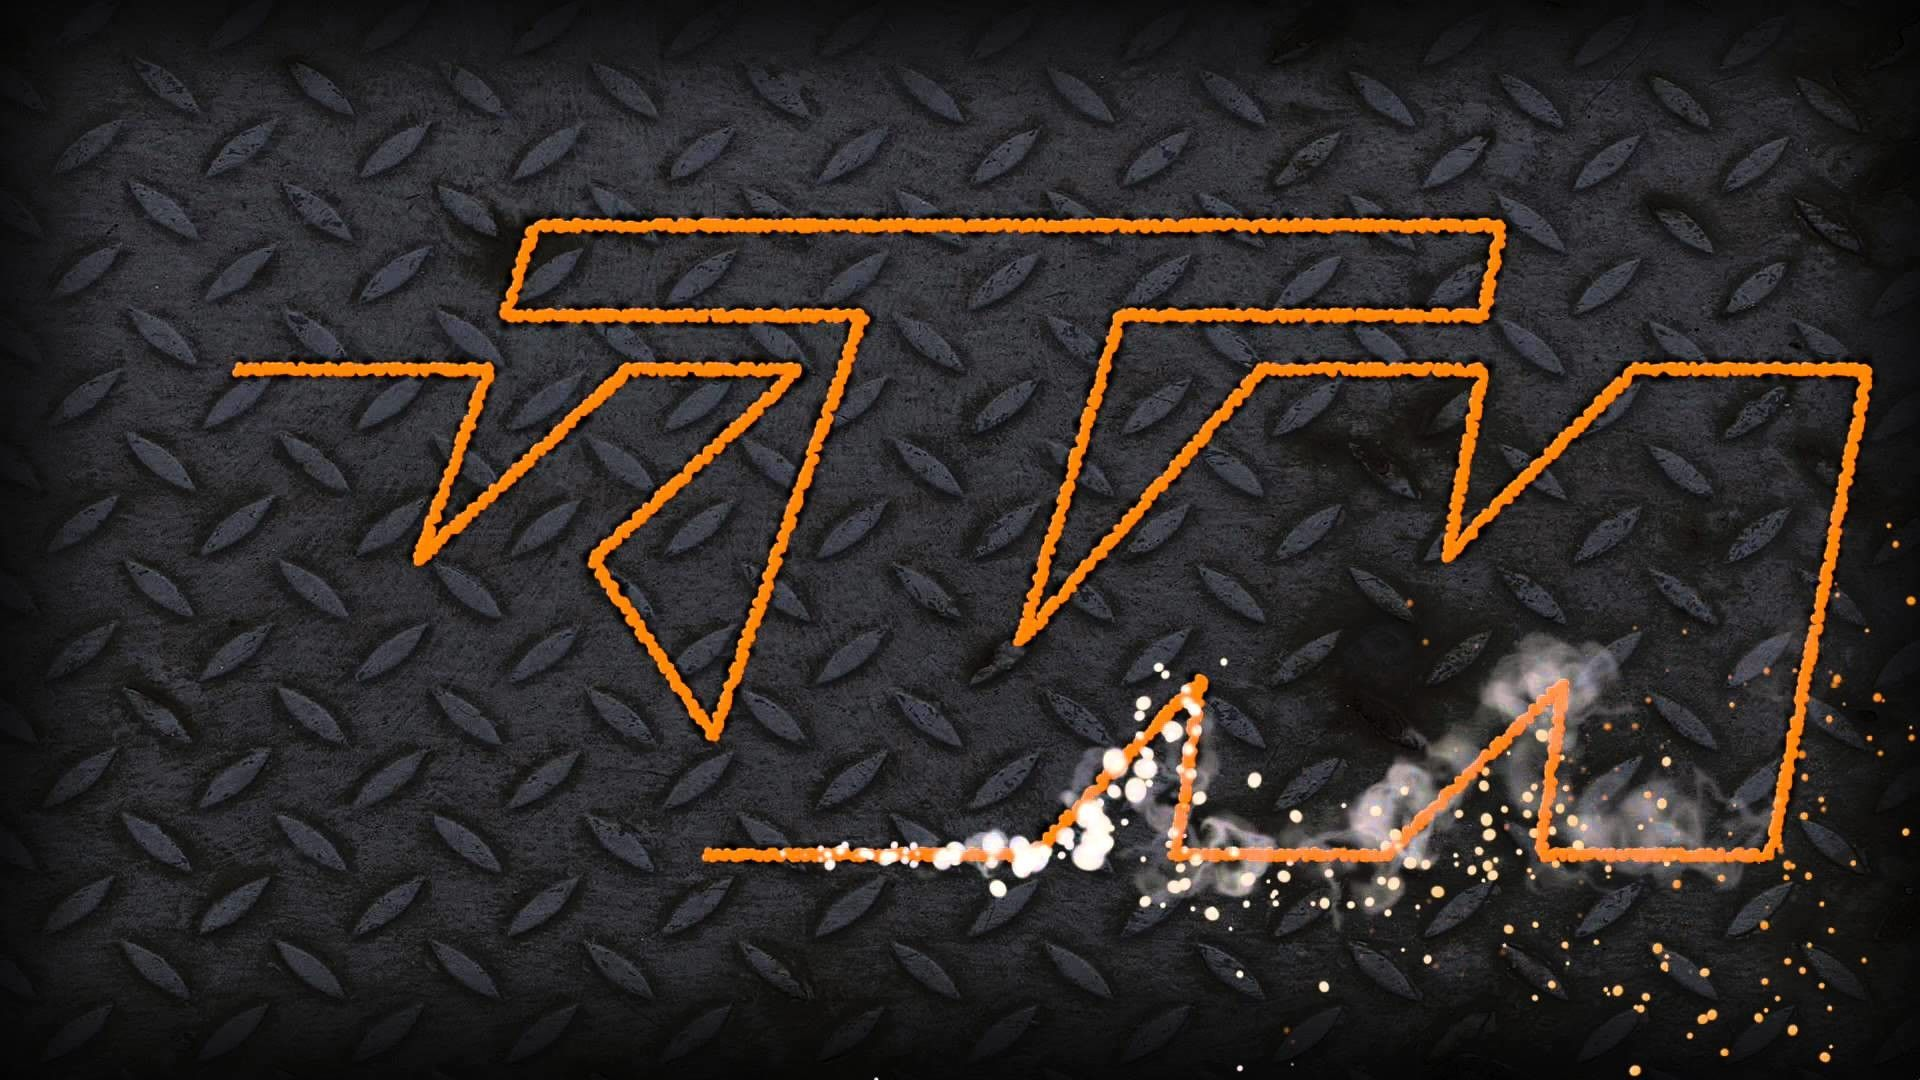 Ktm Logo Hd Wallpaper Get portrait ktm logo hd wallpaper png